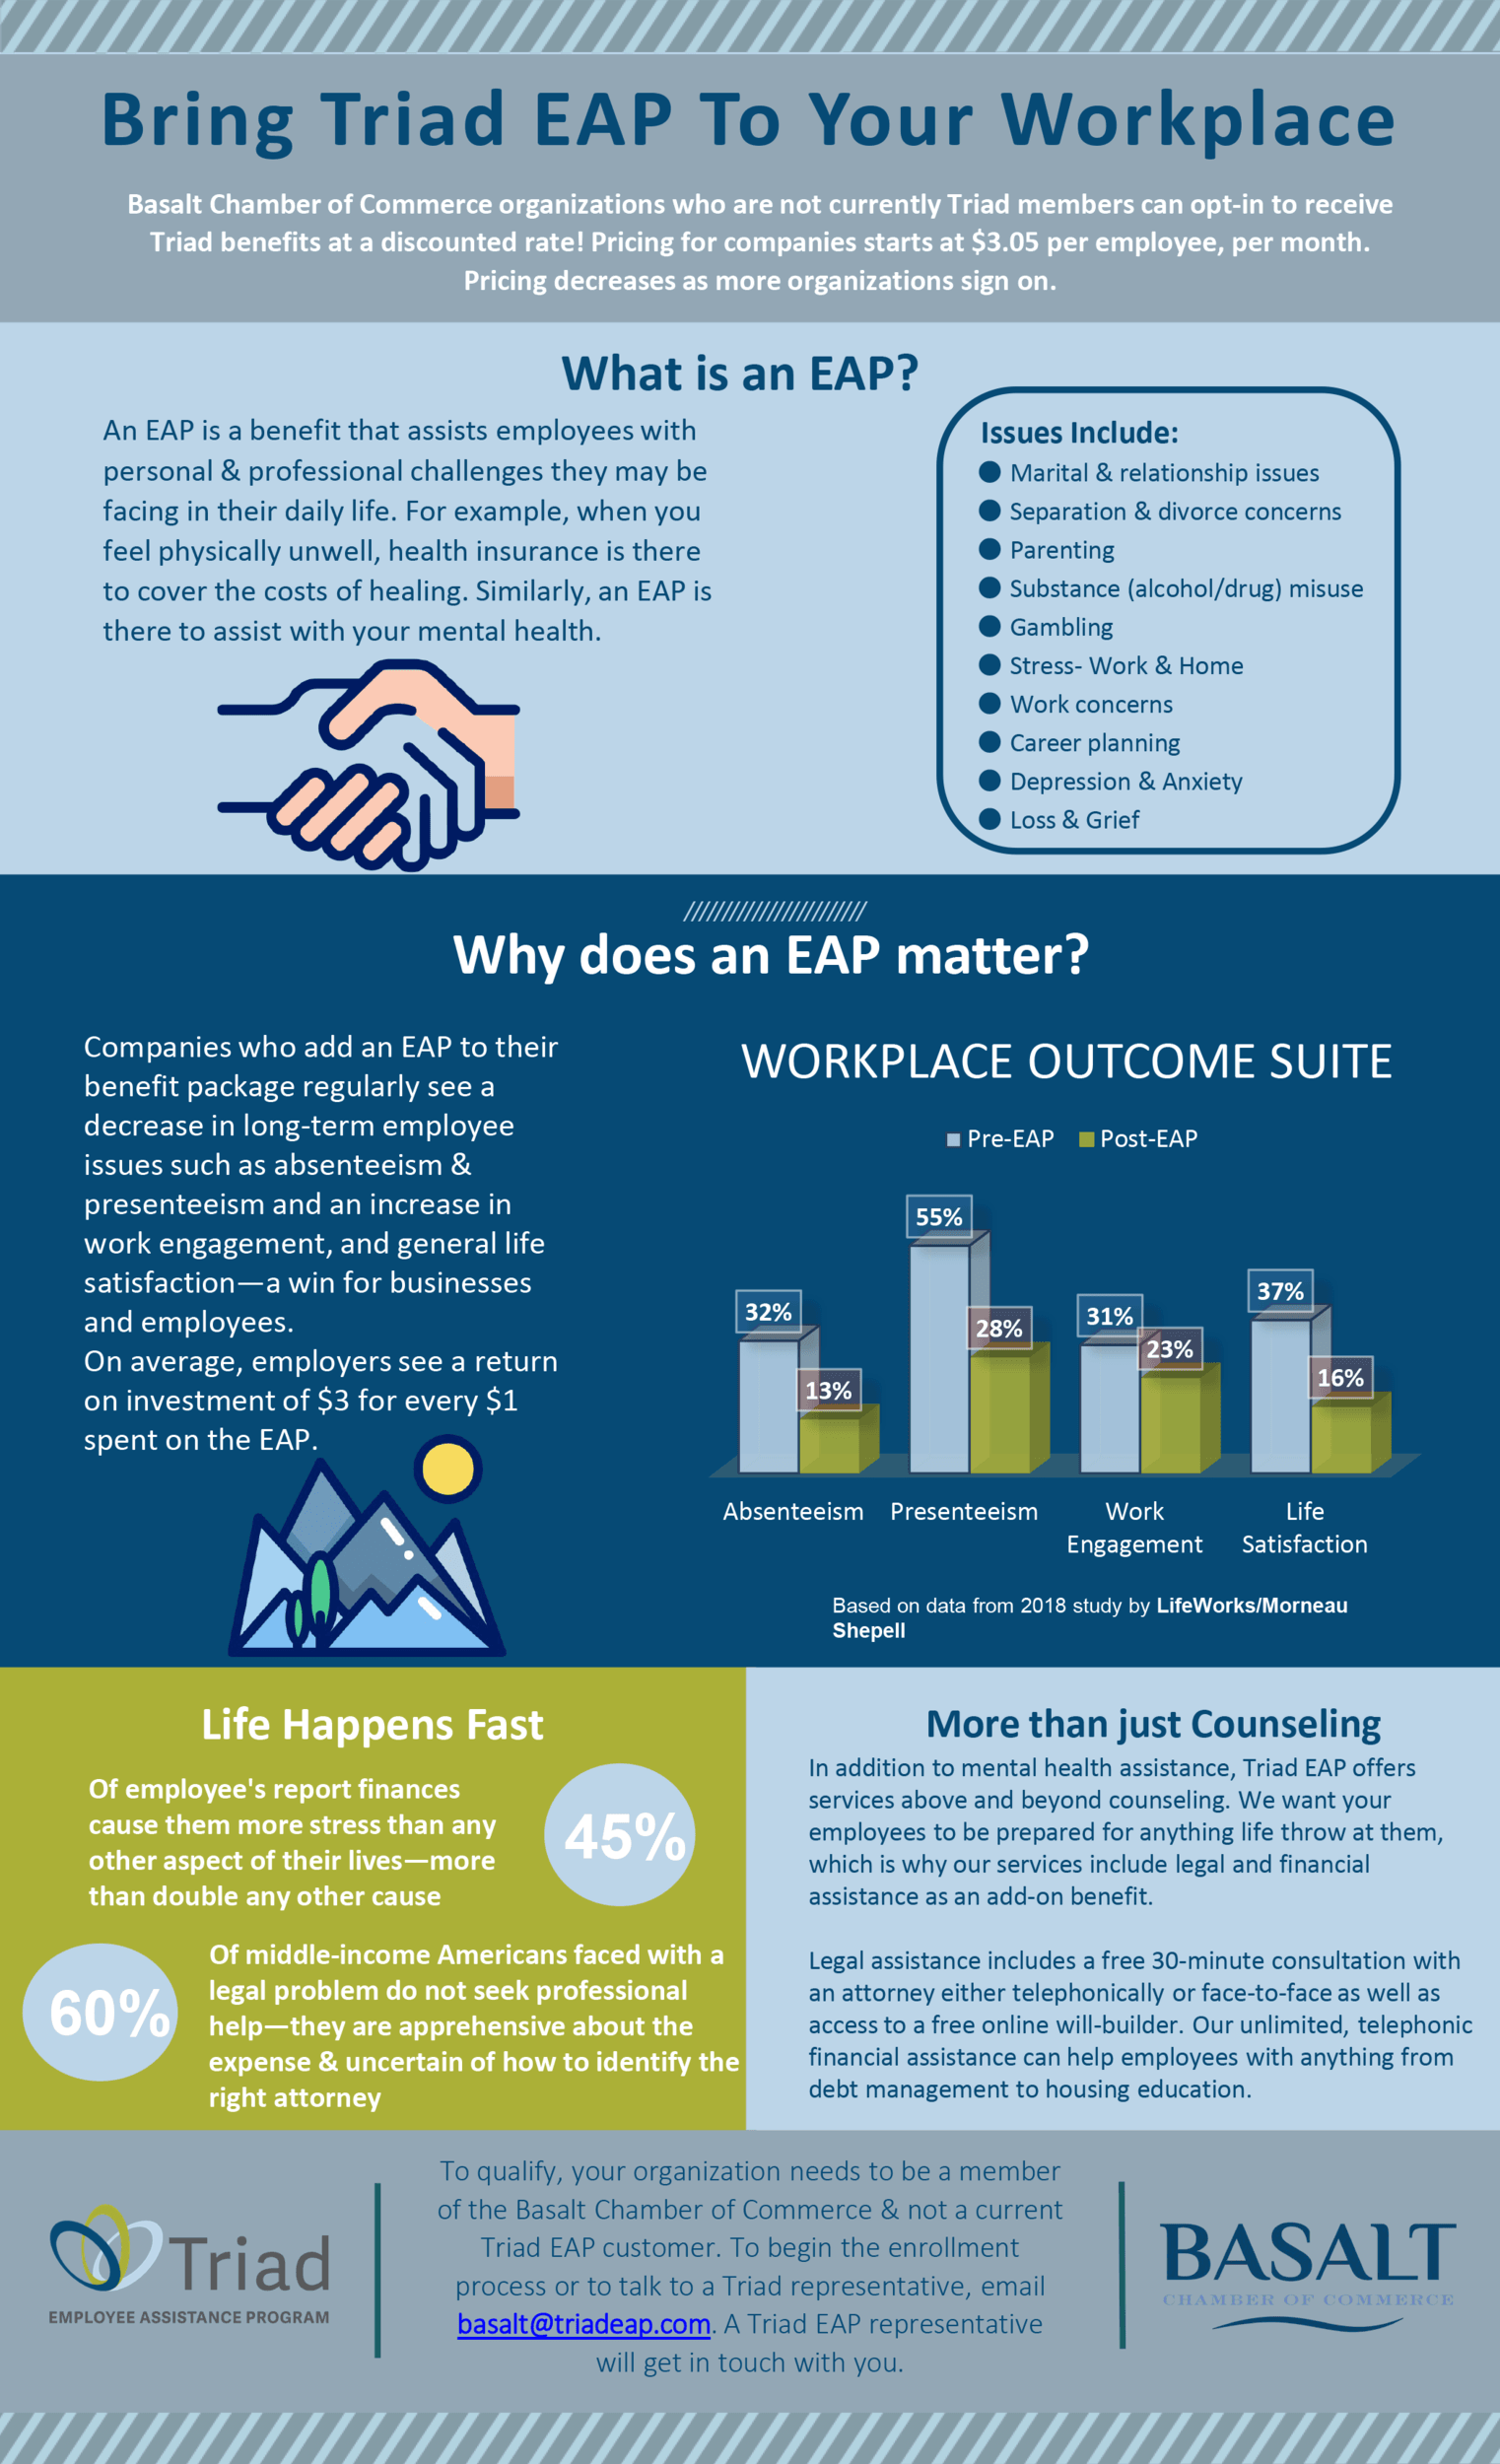 Triad EAP - What is an EAP infographic